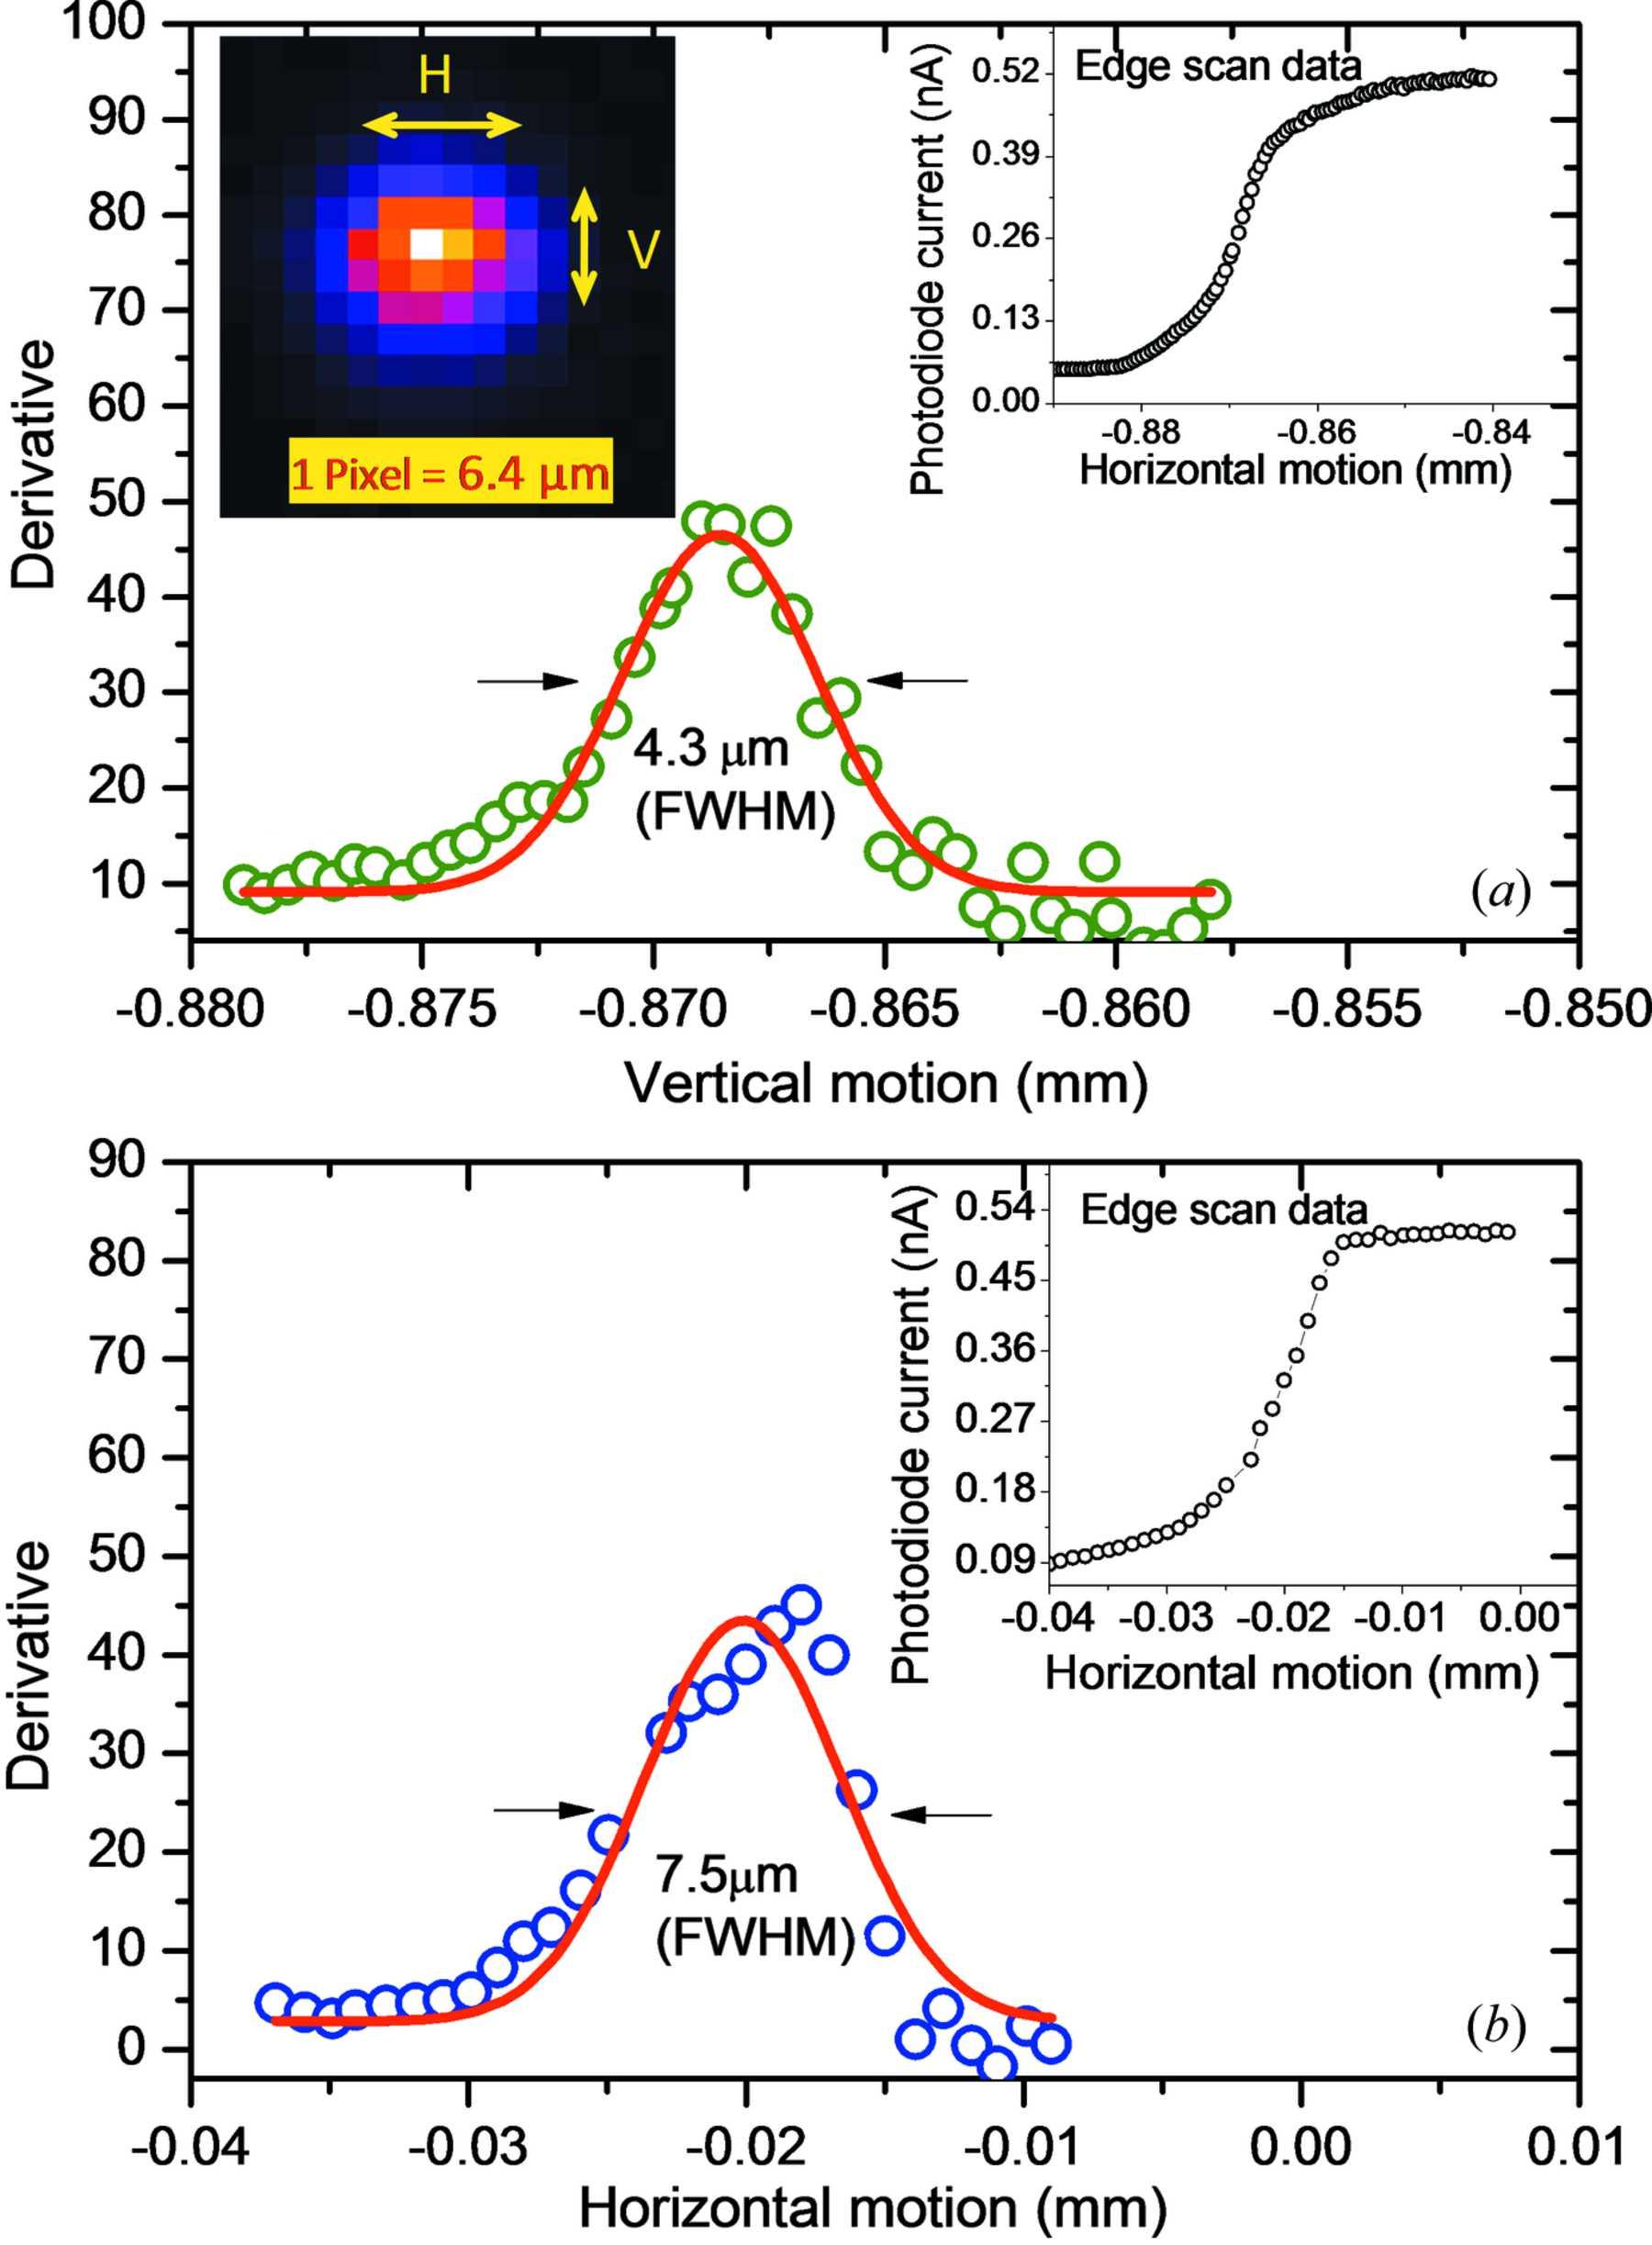 IUCr) A microfocus X-ray fluorescence beamline at Indus-2